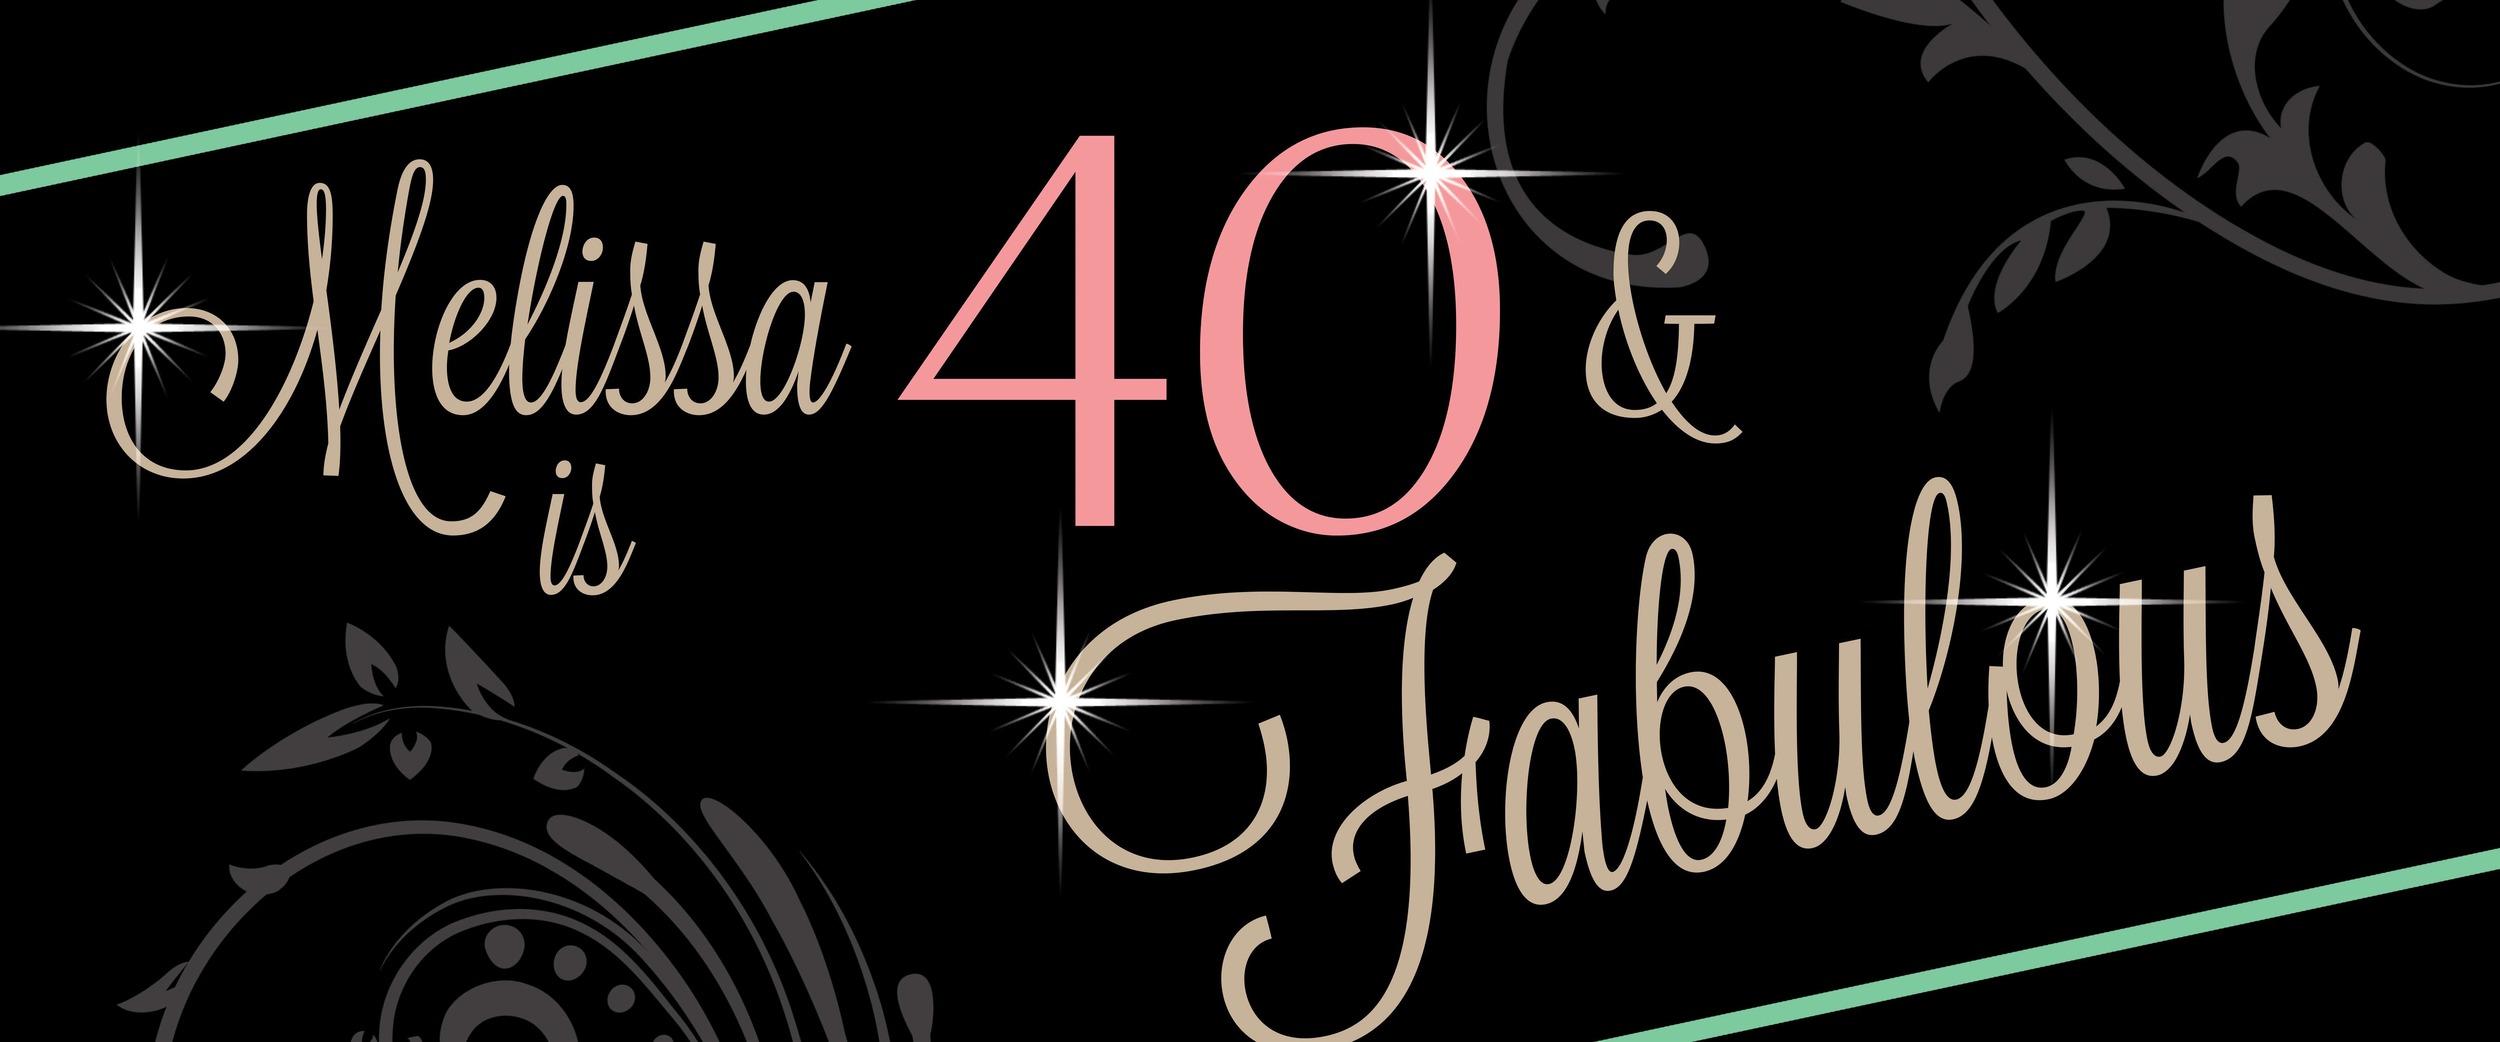 sadie fab 40 banner 2.jpg